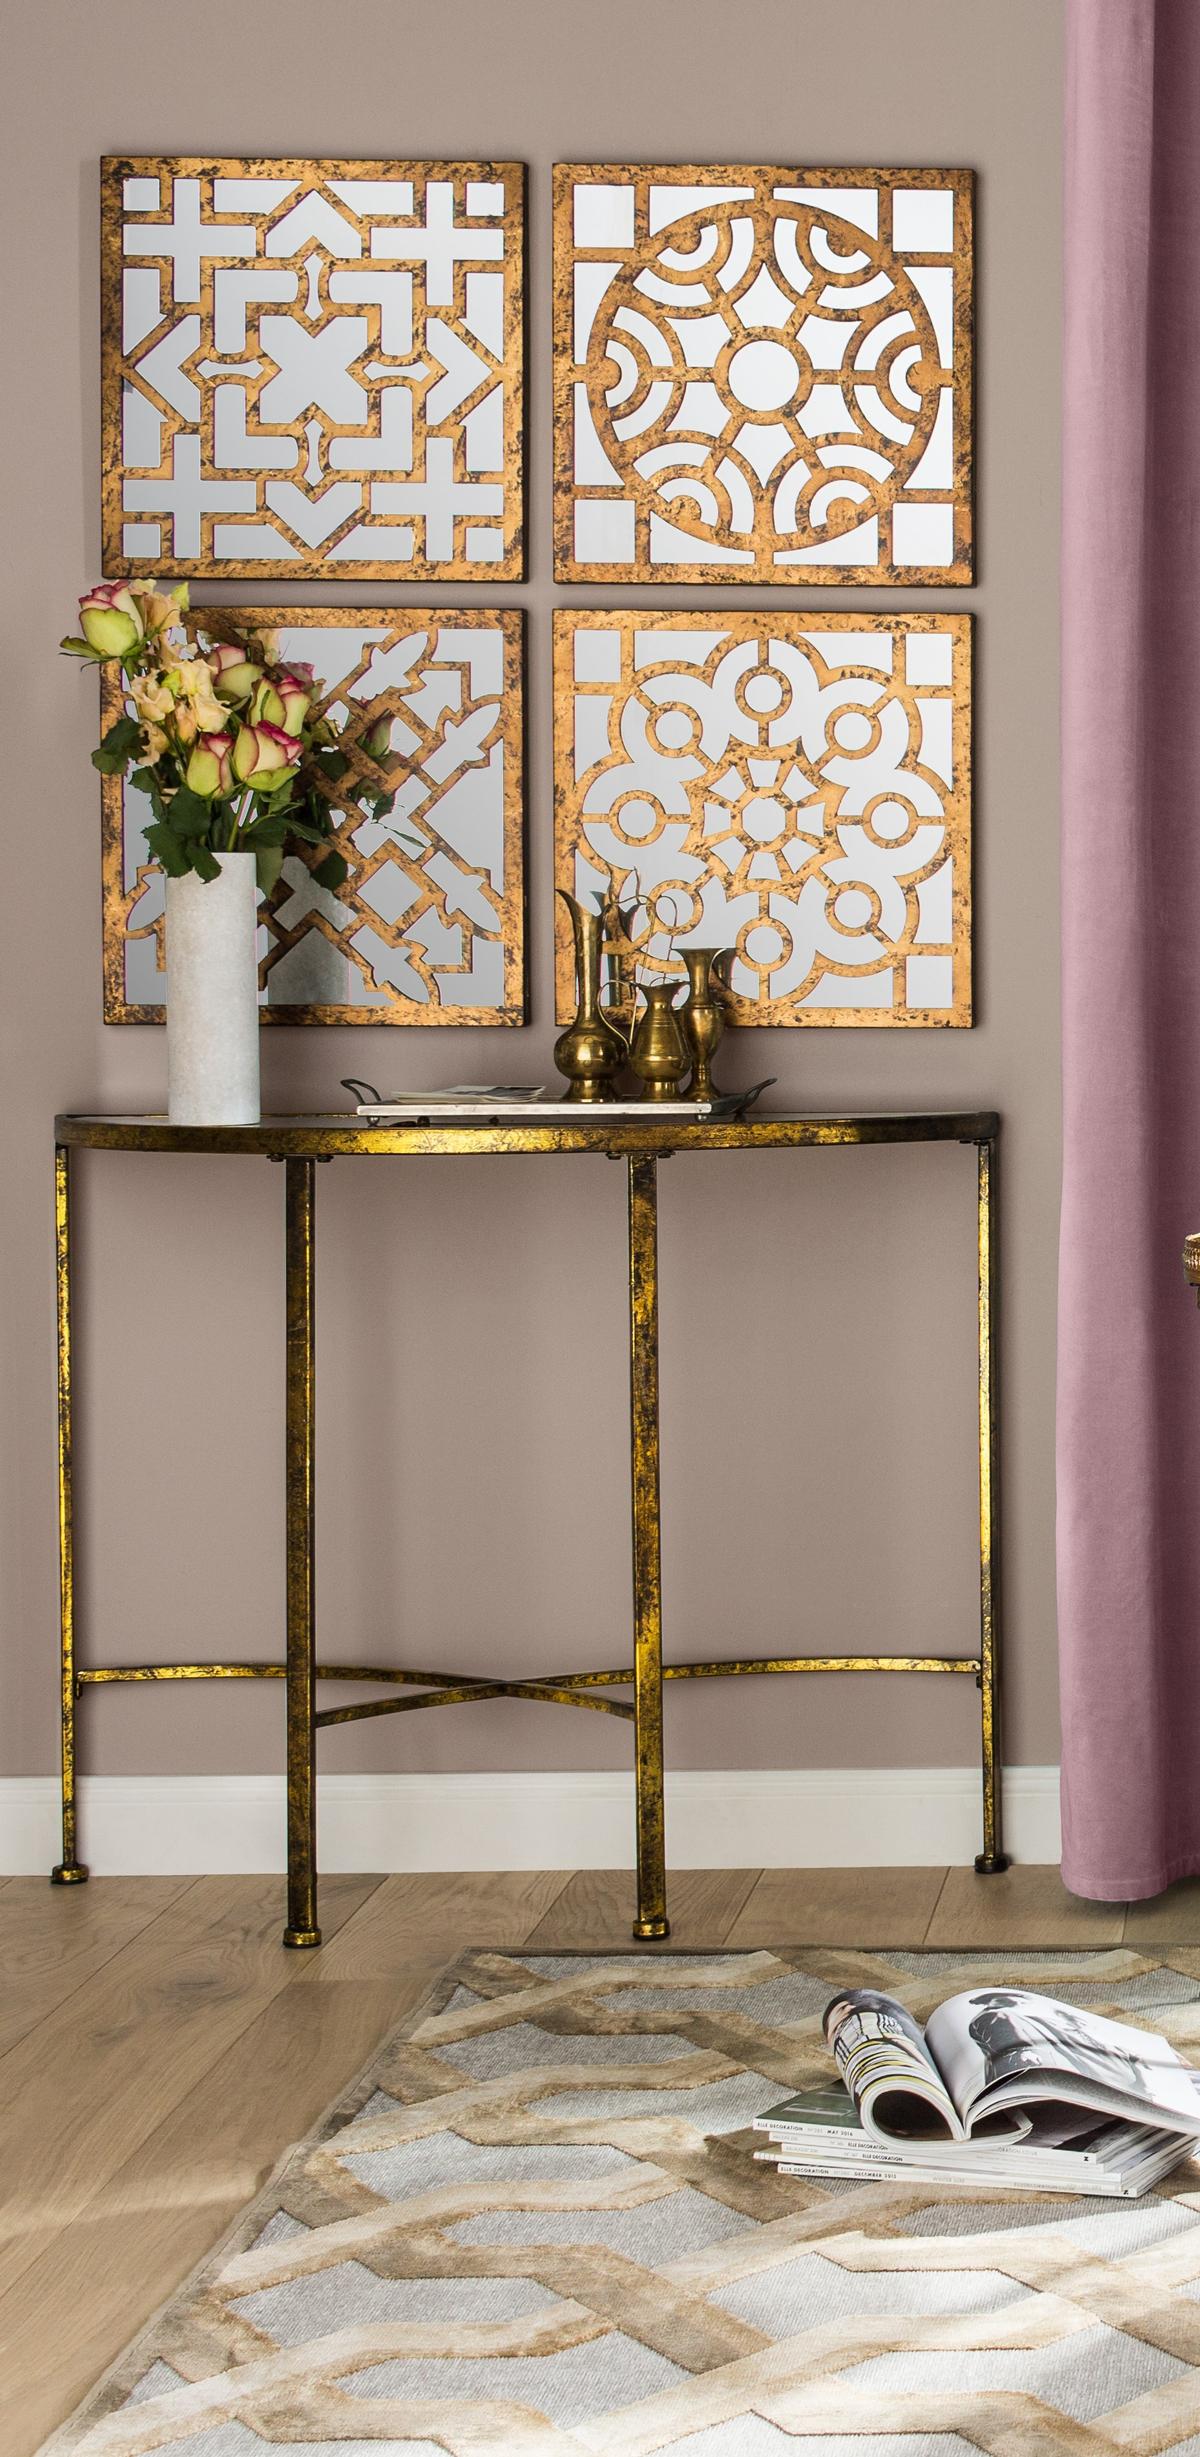 4 Piece Jacinth Mirrored Wall Décor Set | Morrocan decor ...